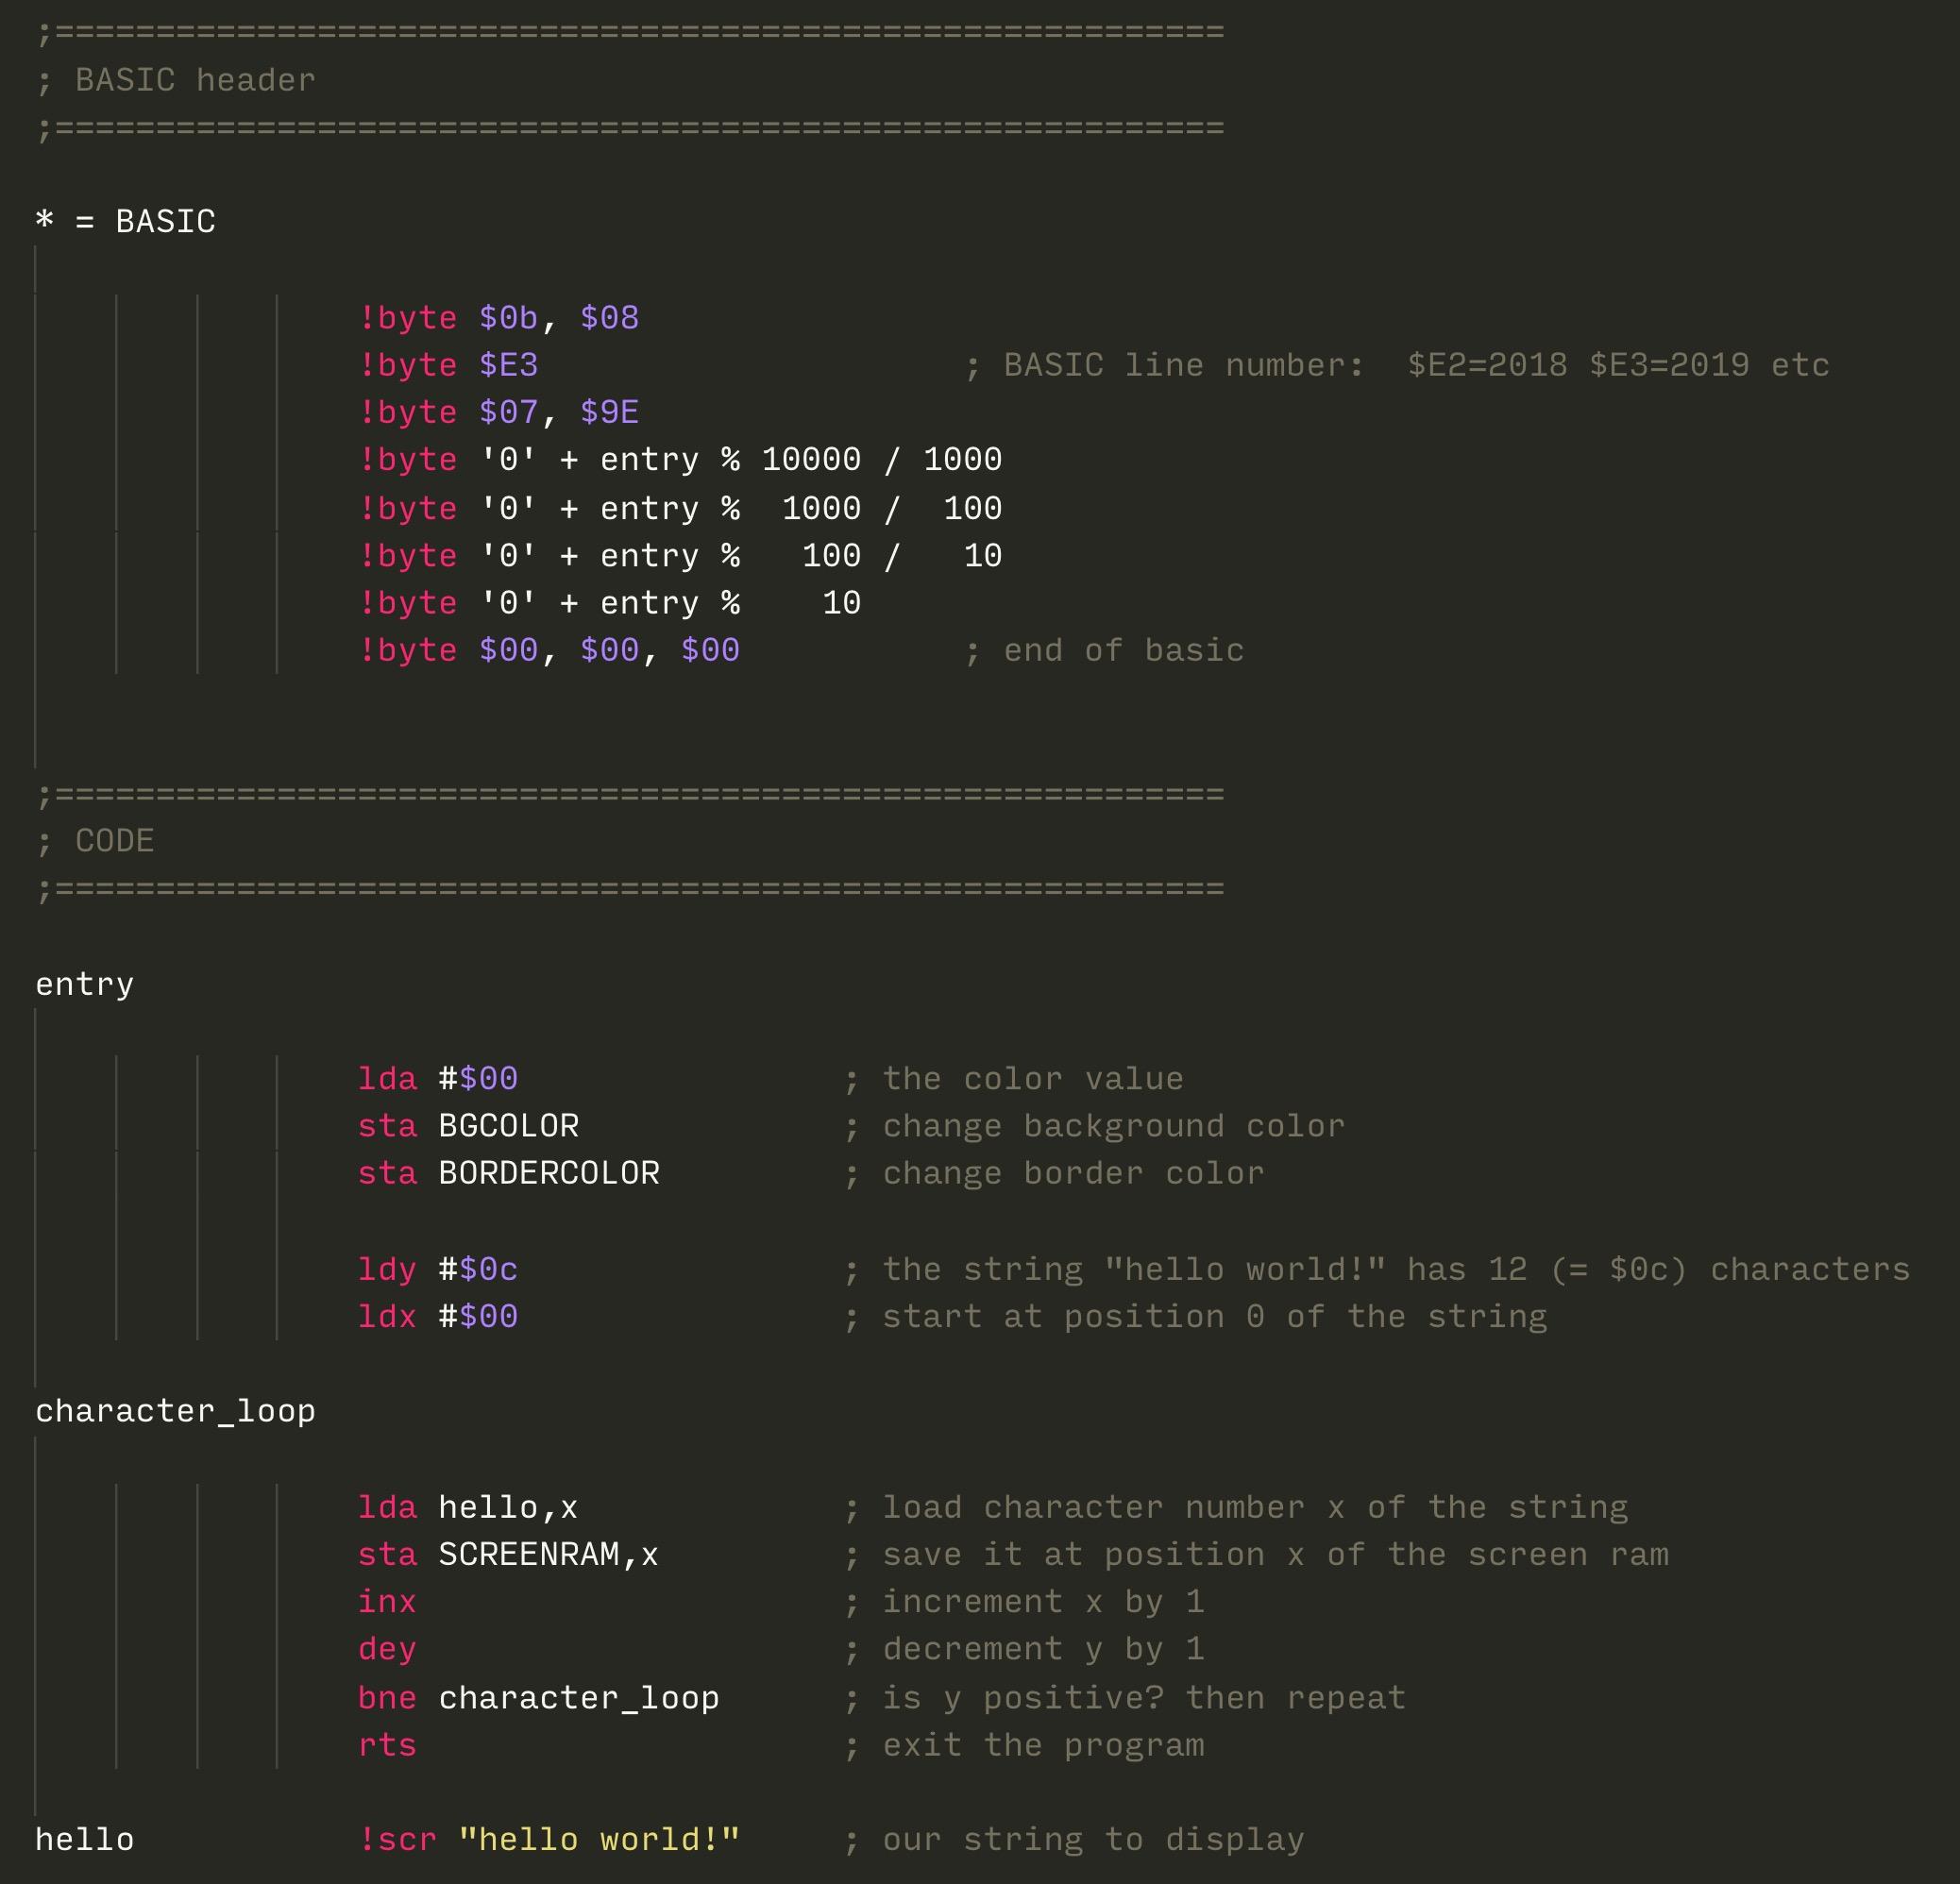 GitHub - Esshahn/acme-assembly-vscode-template: A template